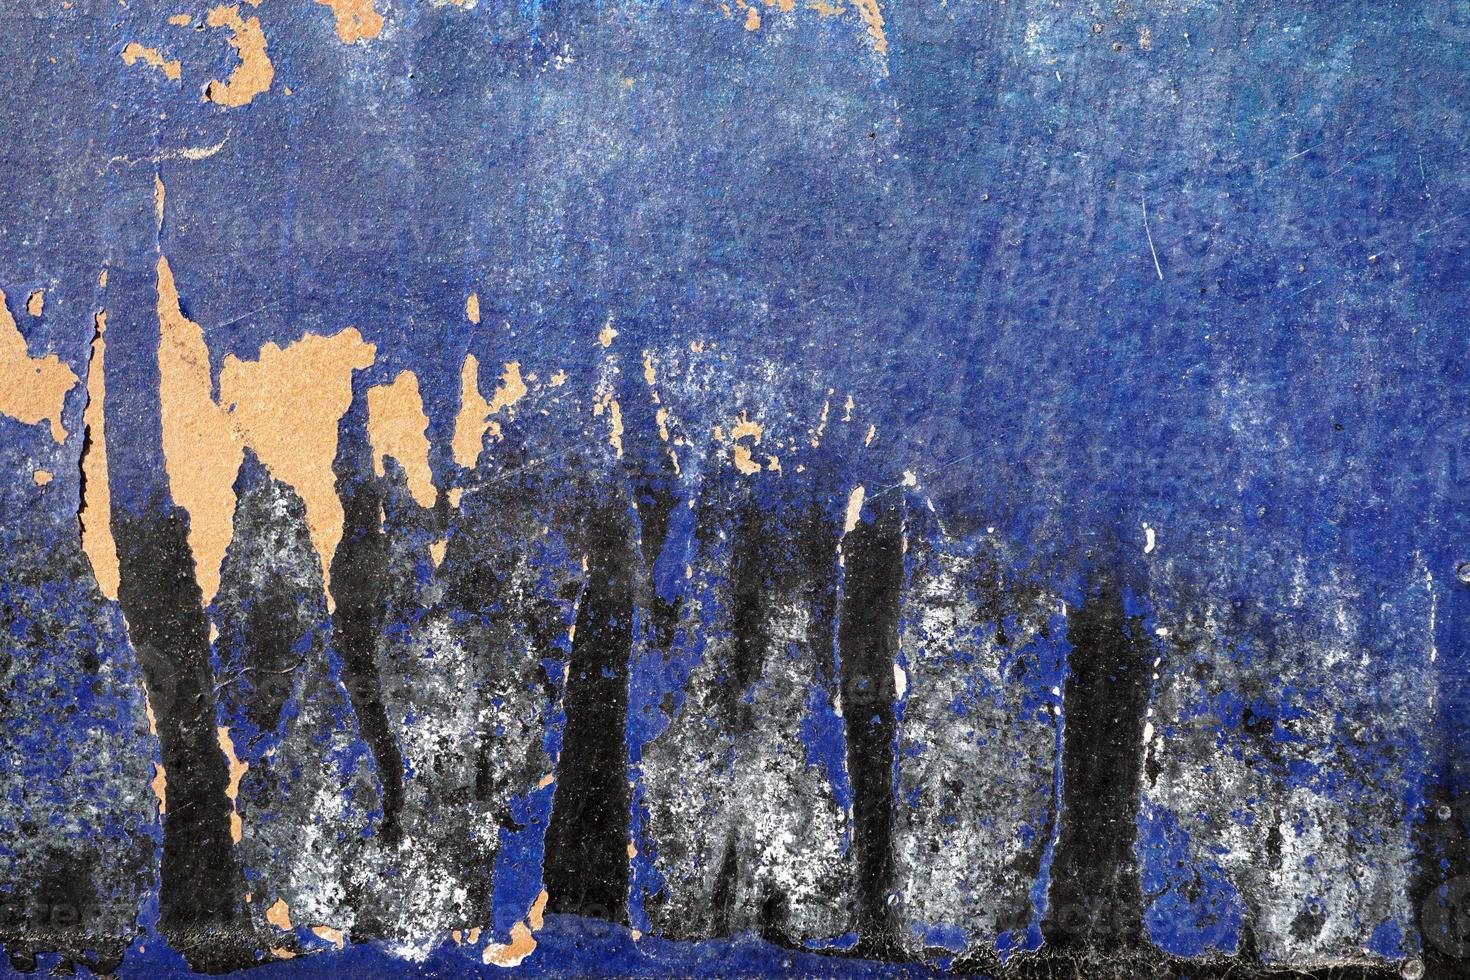 superficie ruvida, graffiata, pelata con pai blu, bianco e nero foto